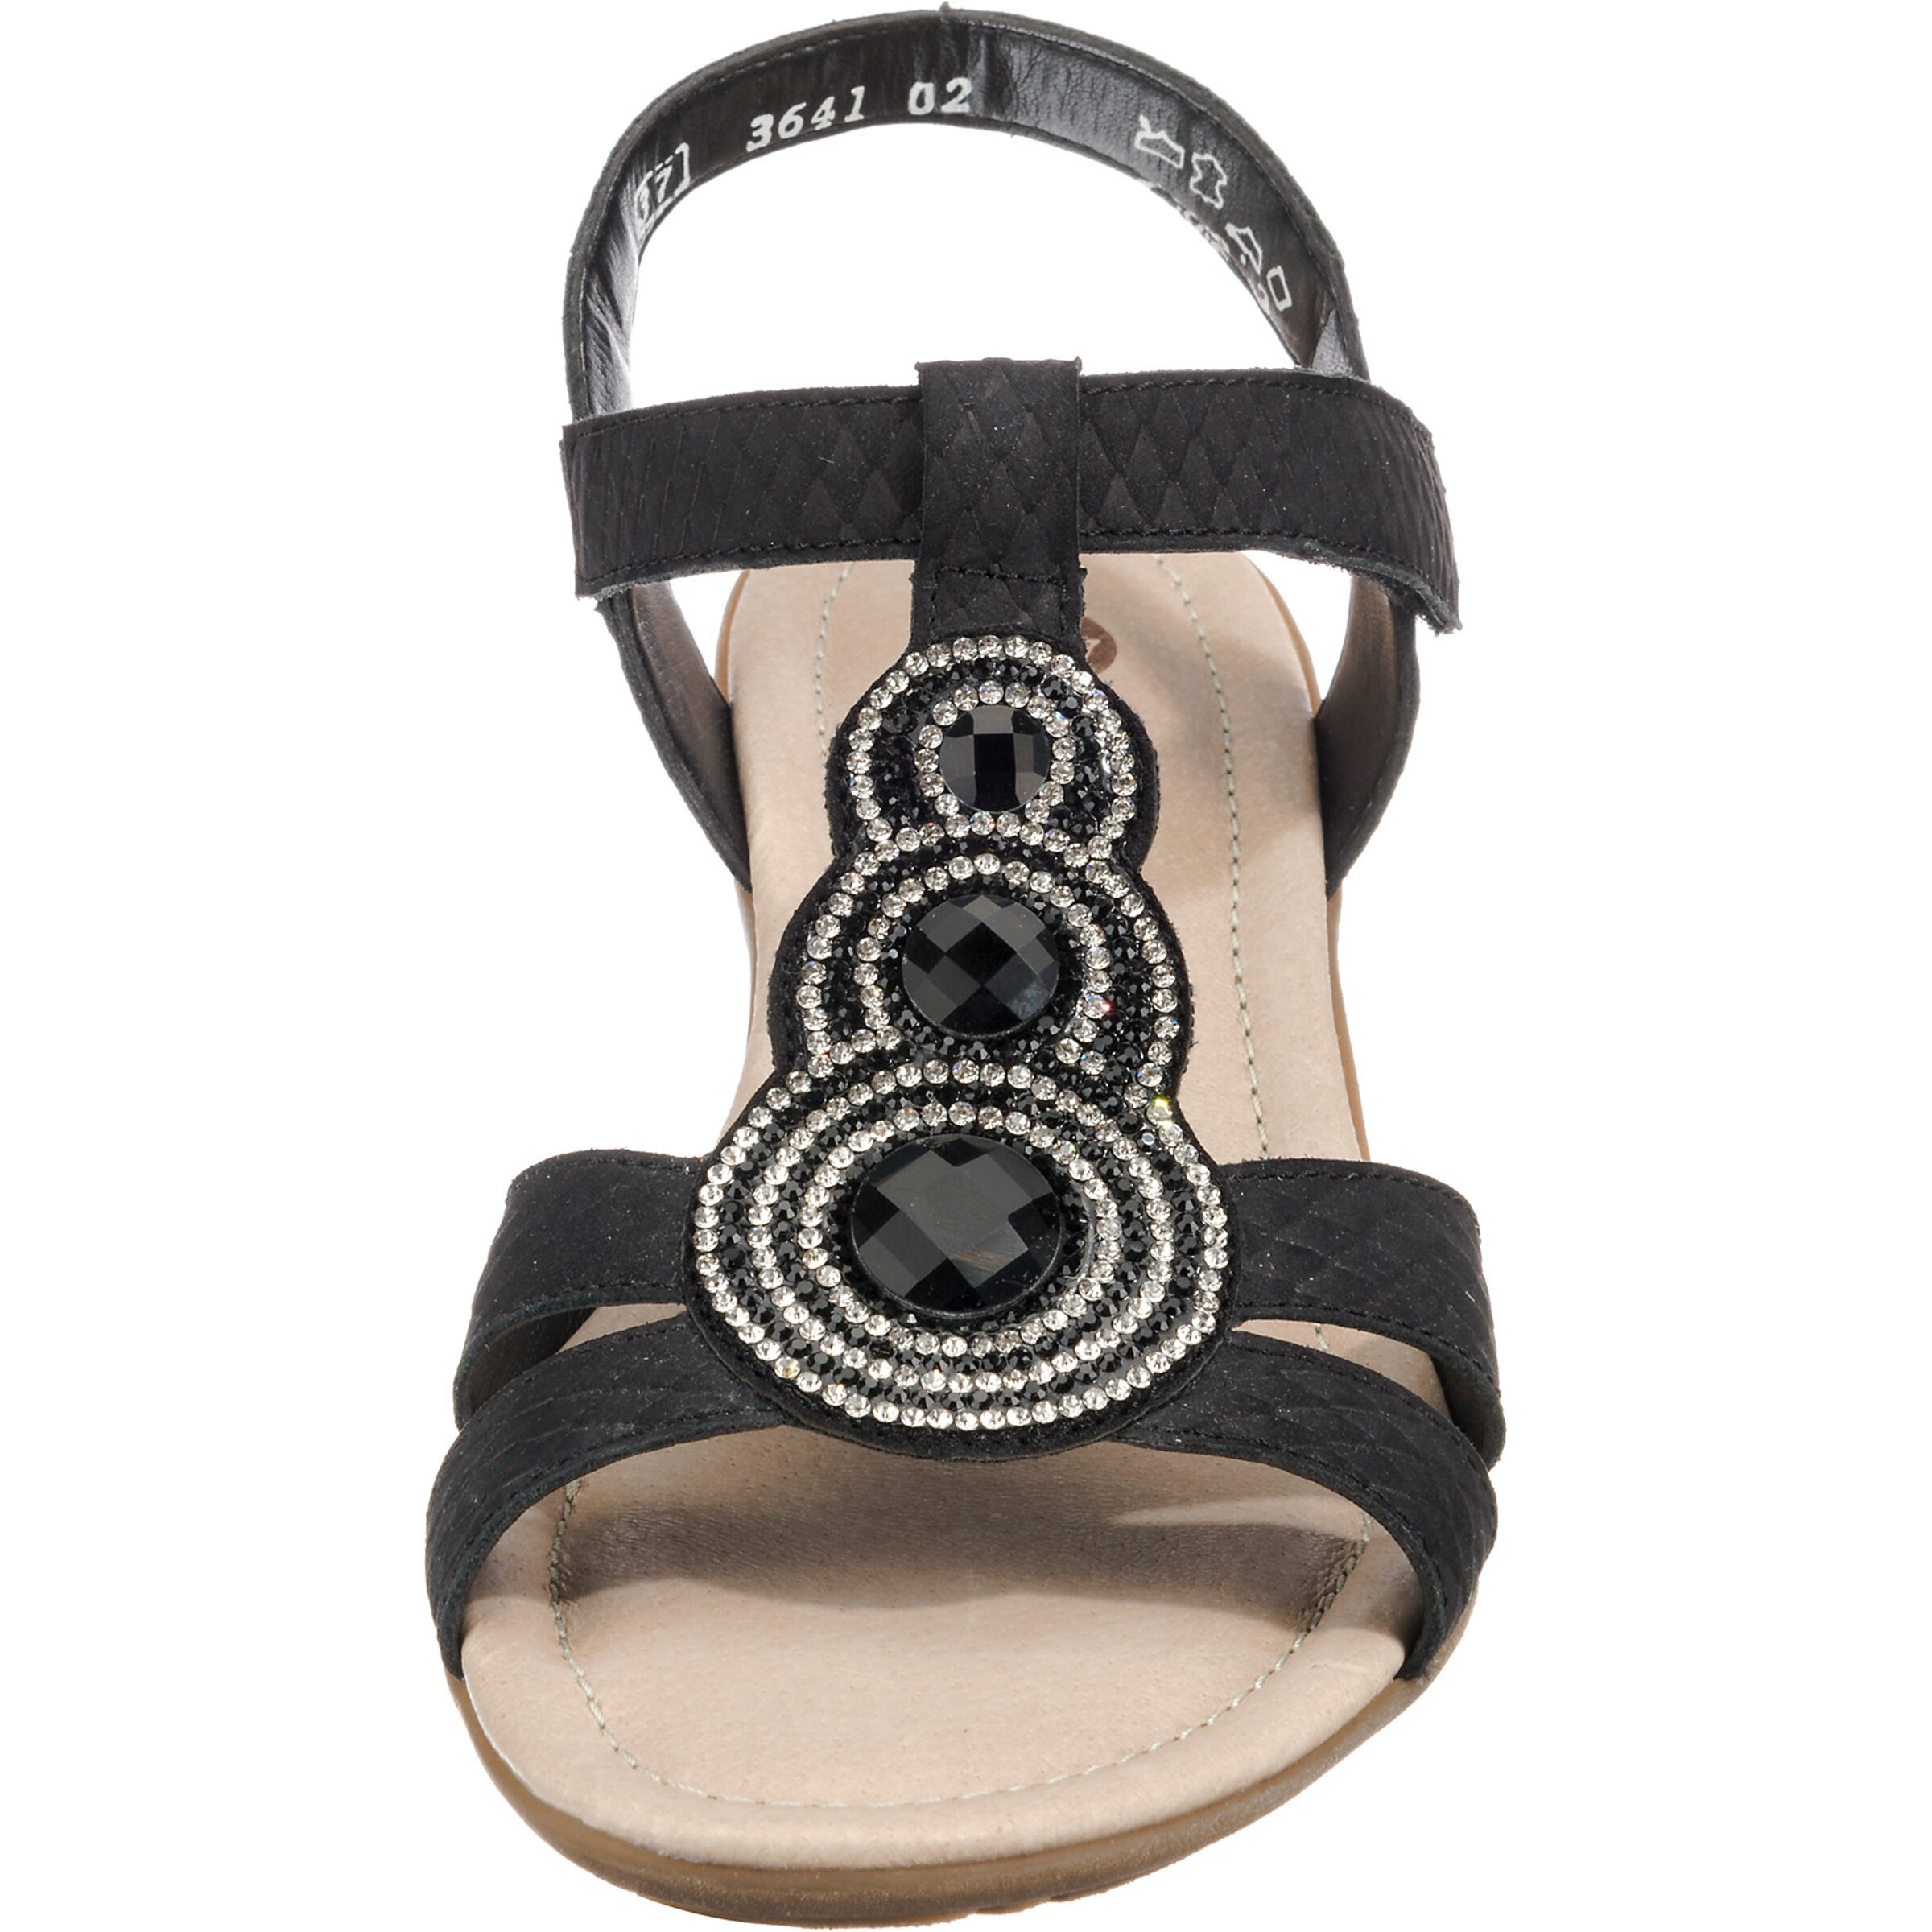 Remonte Remonte In Schwarz 'r3641' 'r3641' Sandale Sandale 4RL35SAjqc